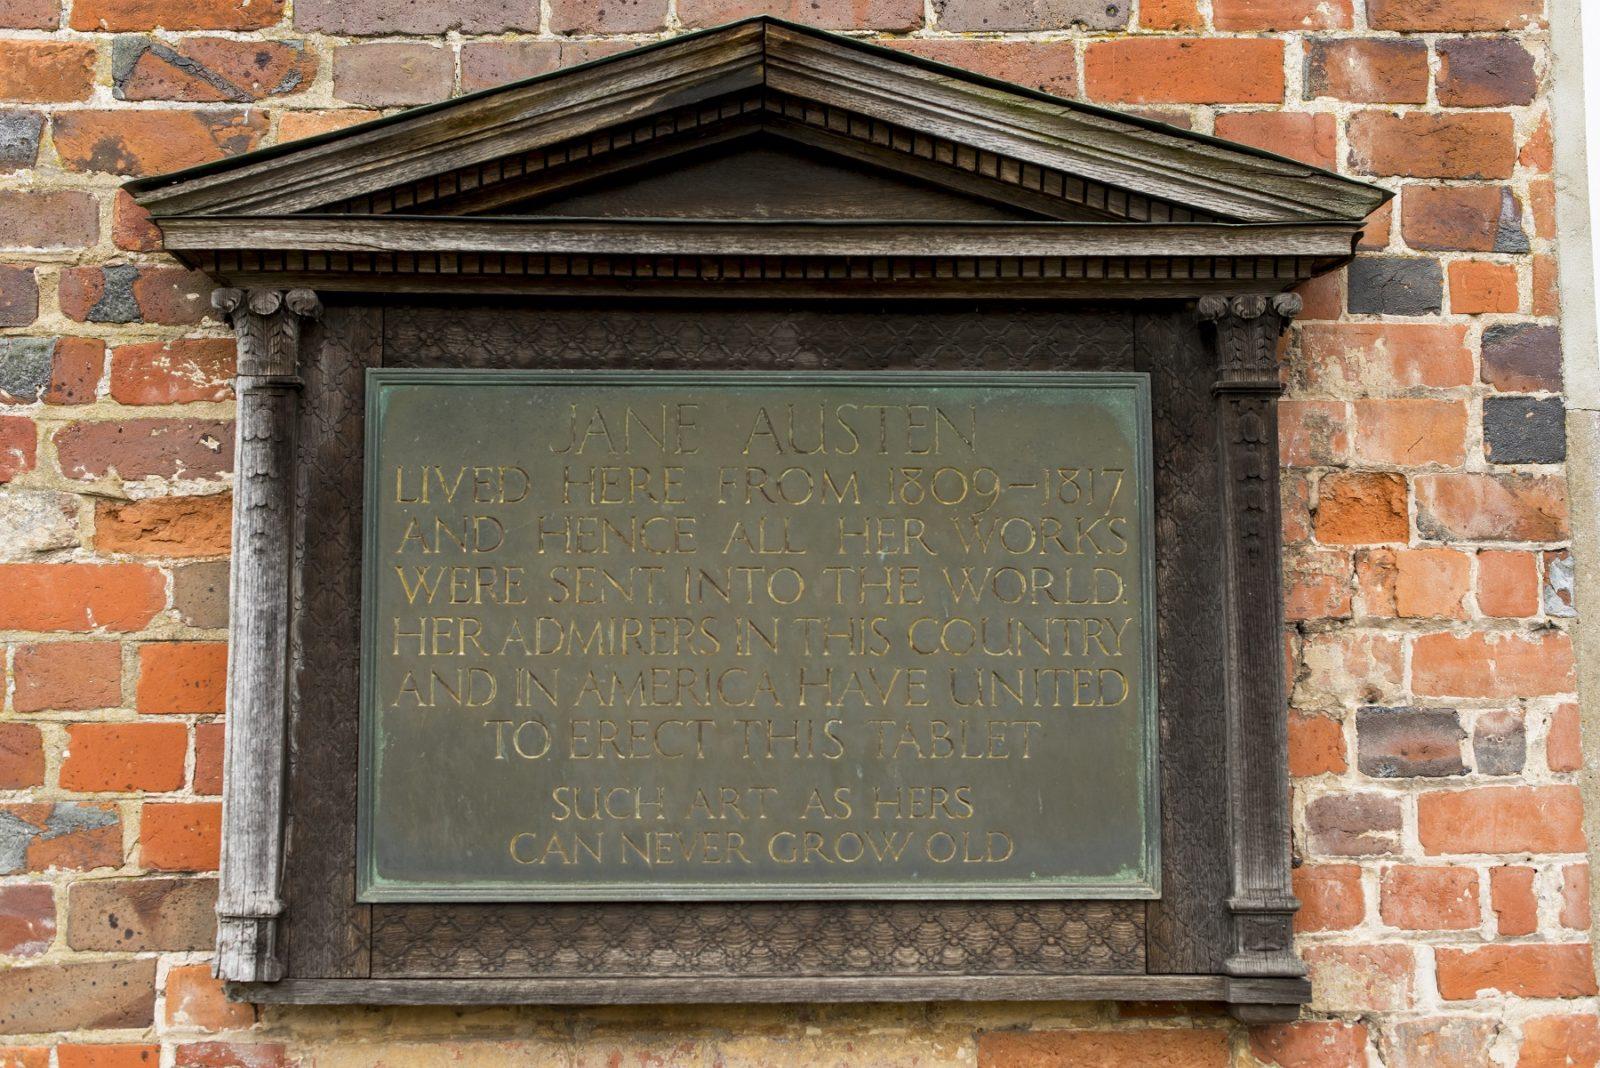 1917 plaque at Jane Austen's House